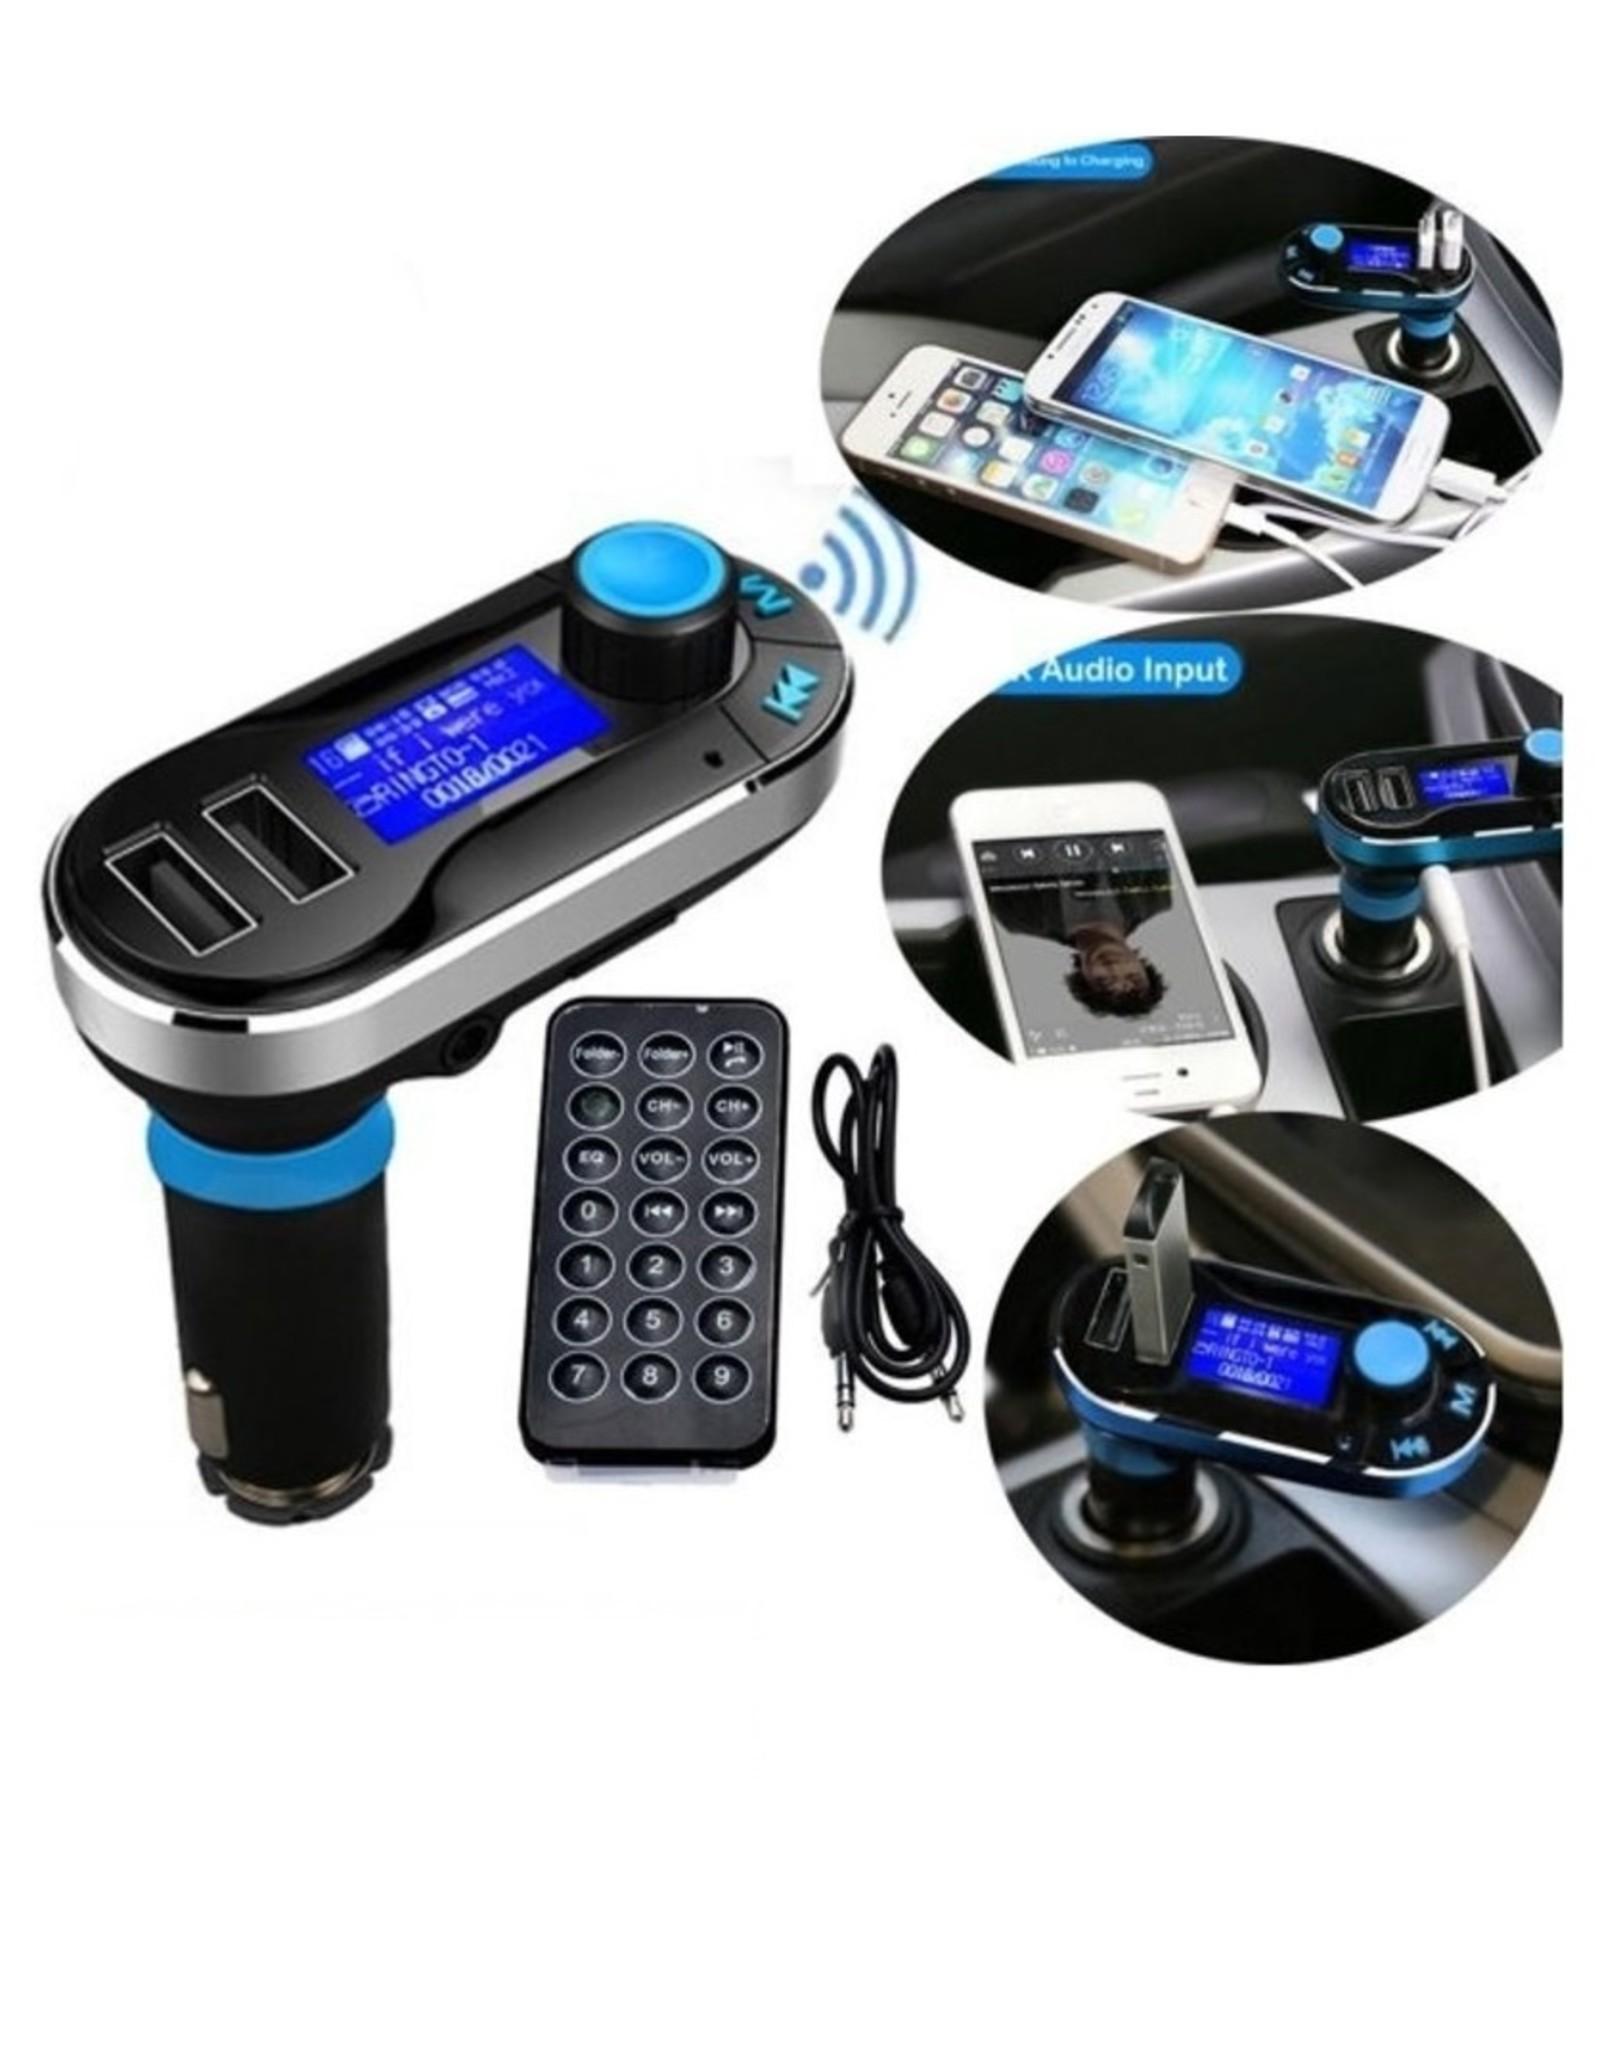 Parya Official Parya Official - Draadloze Bluetooth Carkit - Blauw